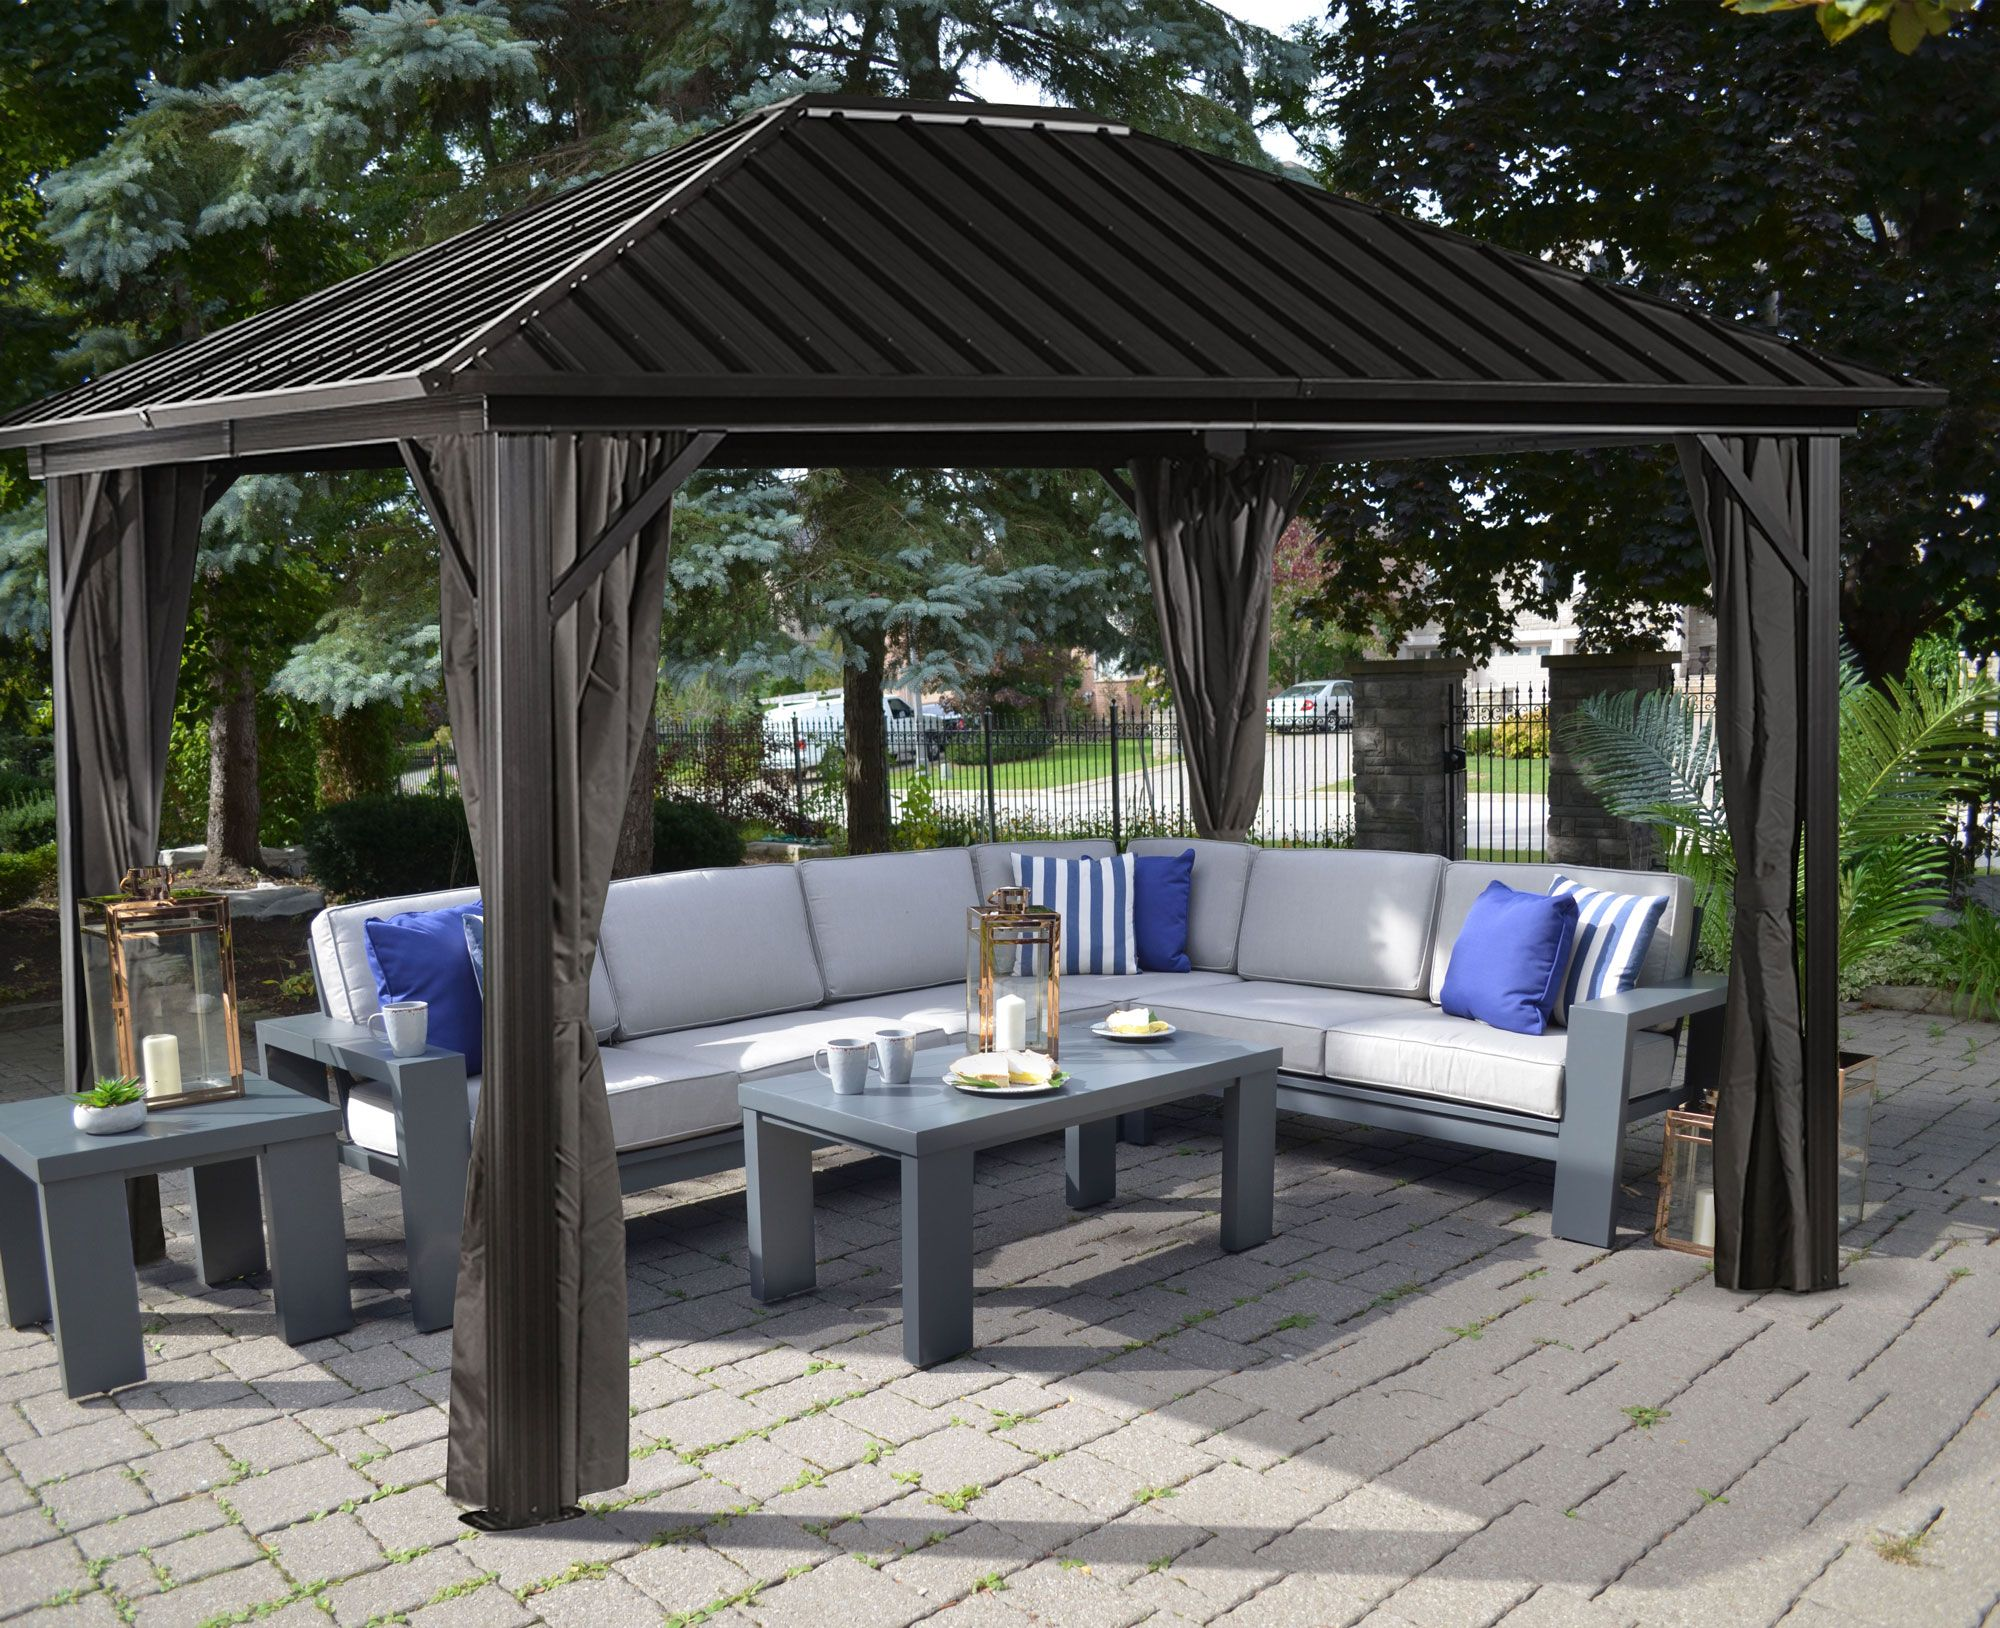 0b4f56fabbbb91b1181154097b441f96 - Better Homes And Gardens Hardtop Gazebo 10x10 Instructions